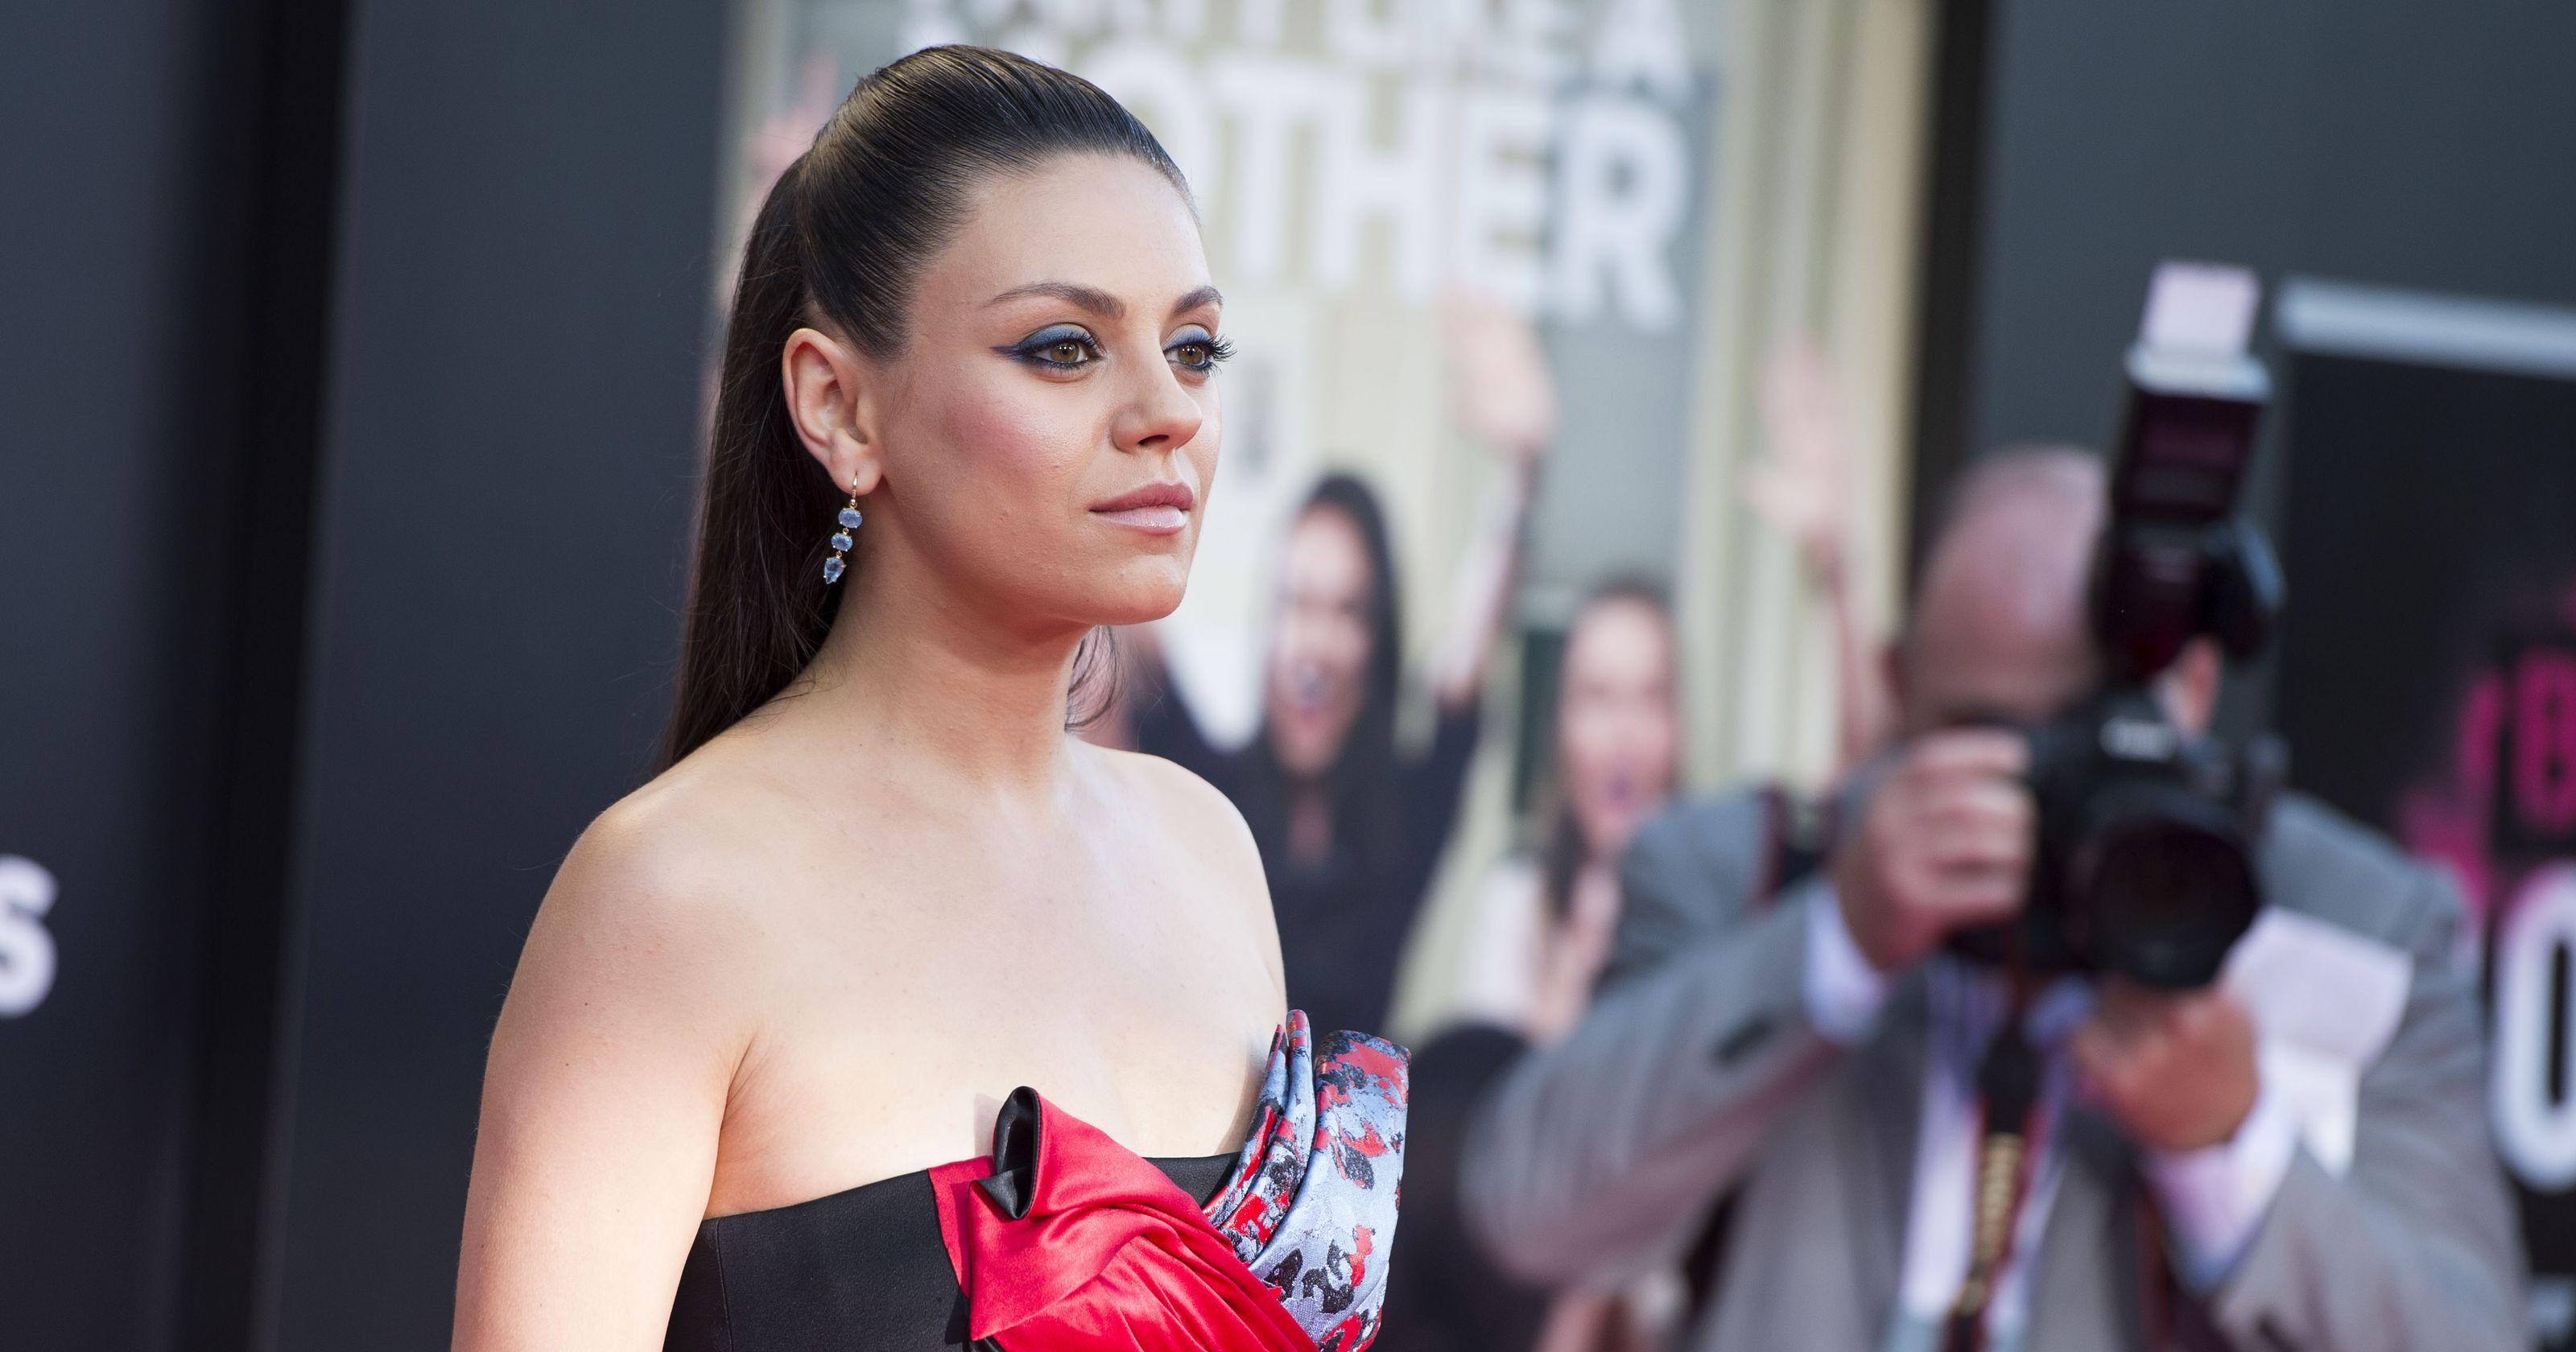 Mila Kunis slams sexist producer  , http://bostondesiconnection.com/mila-kunis-slams-sexist-producer/,  #MilaKunisslamssexistproducer